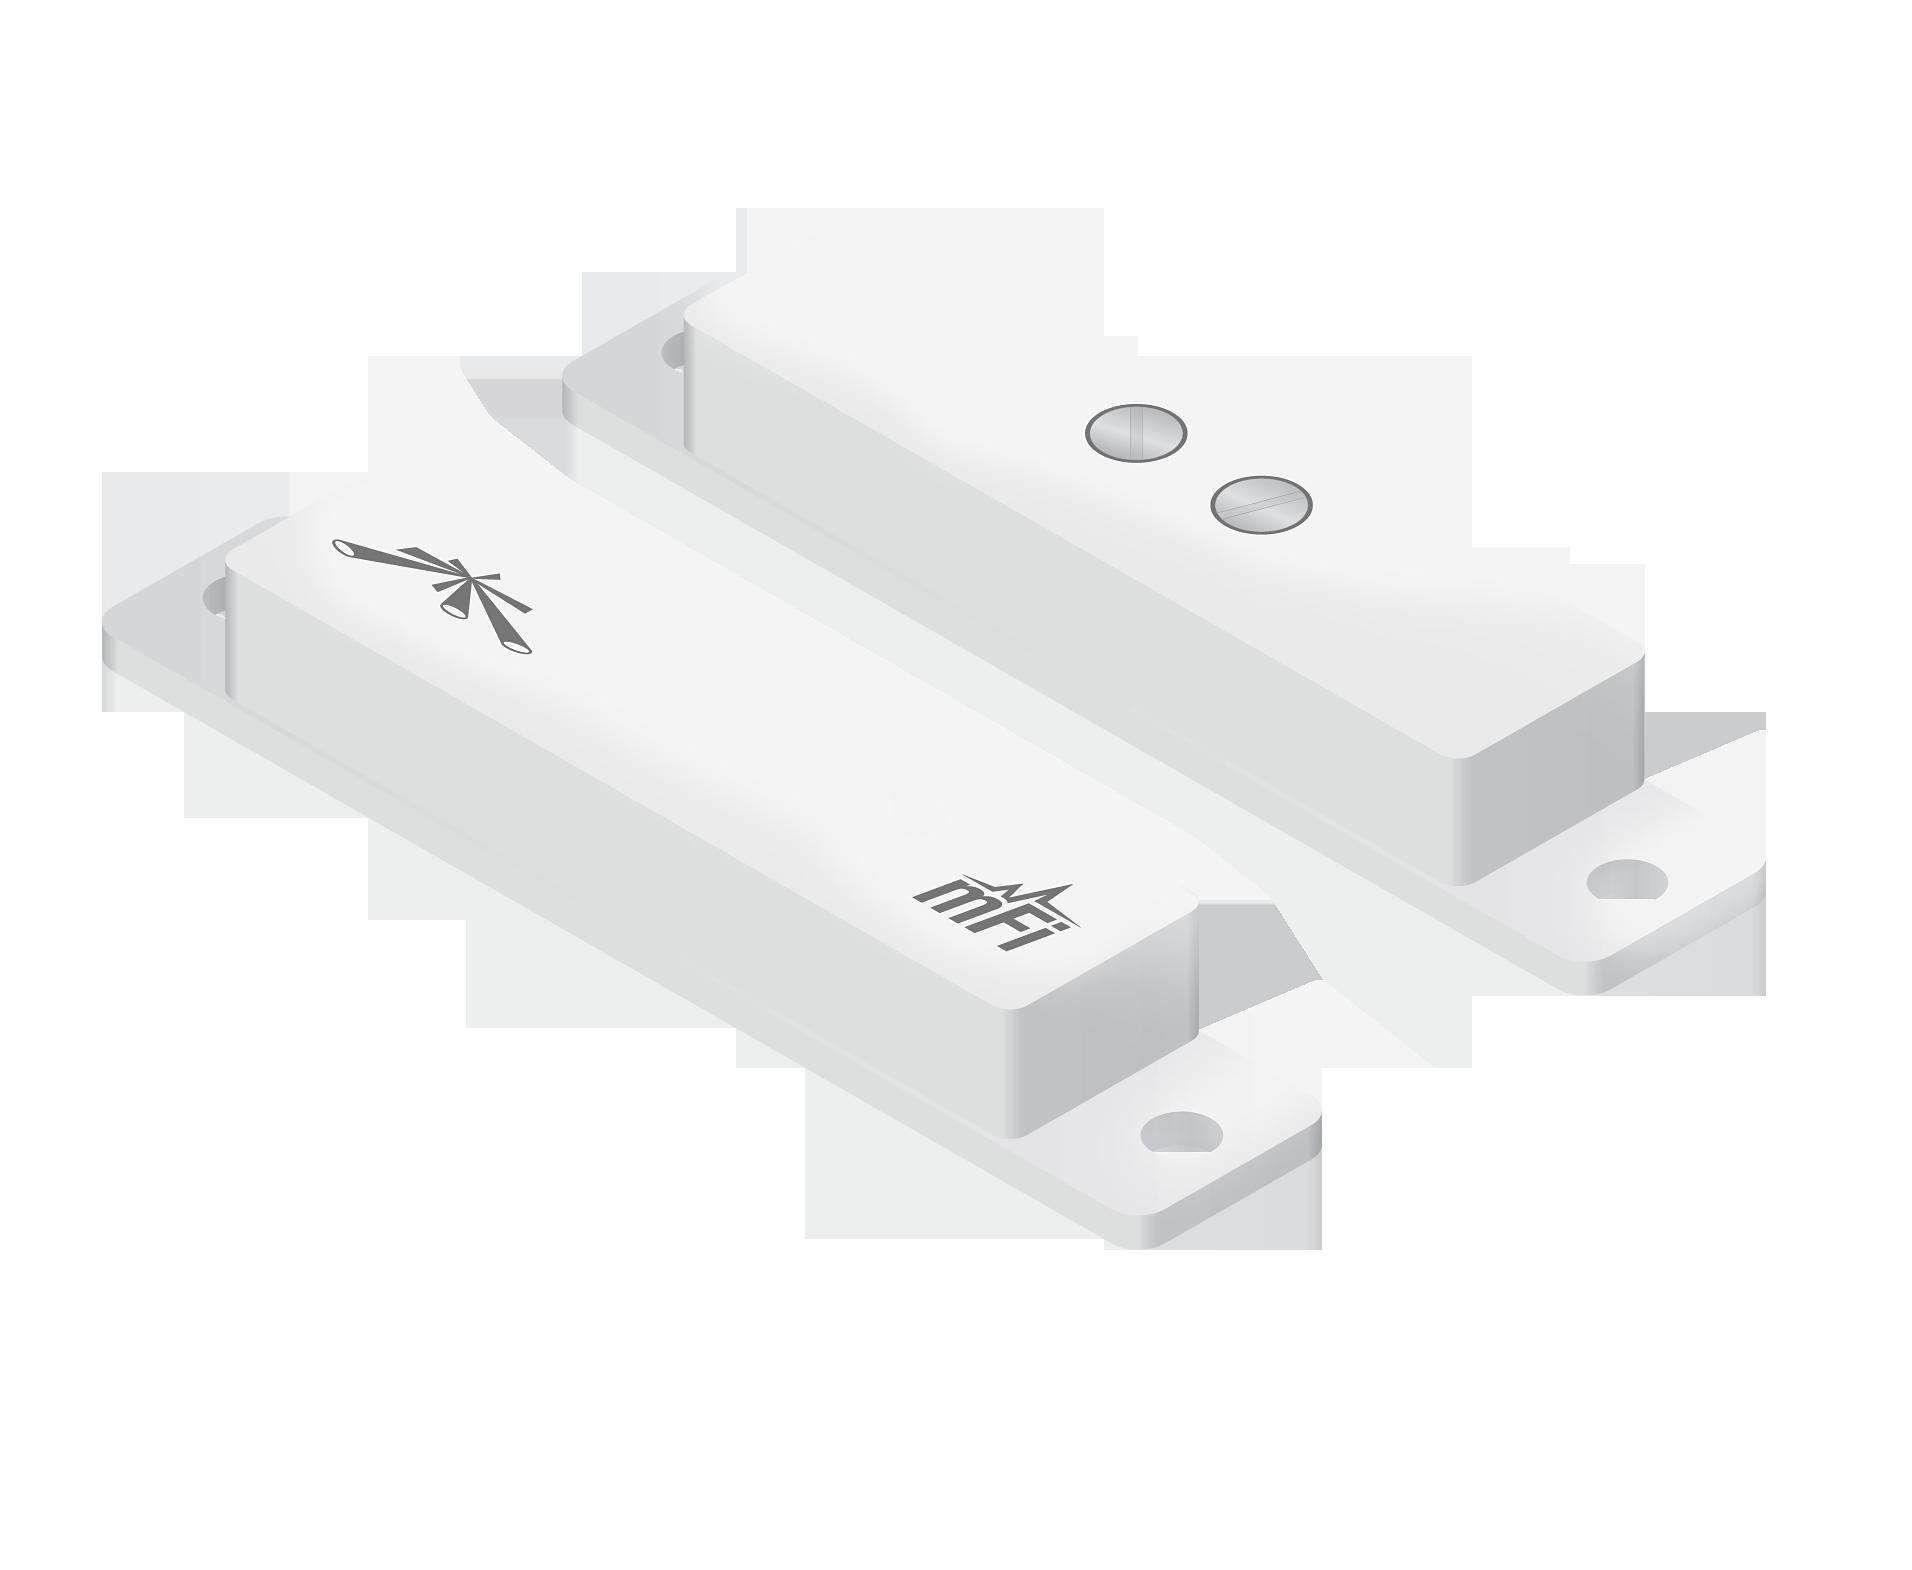 mFi-DS Ubiquiti mFi, Door Sensor - Kapı Sensörü